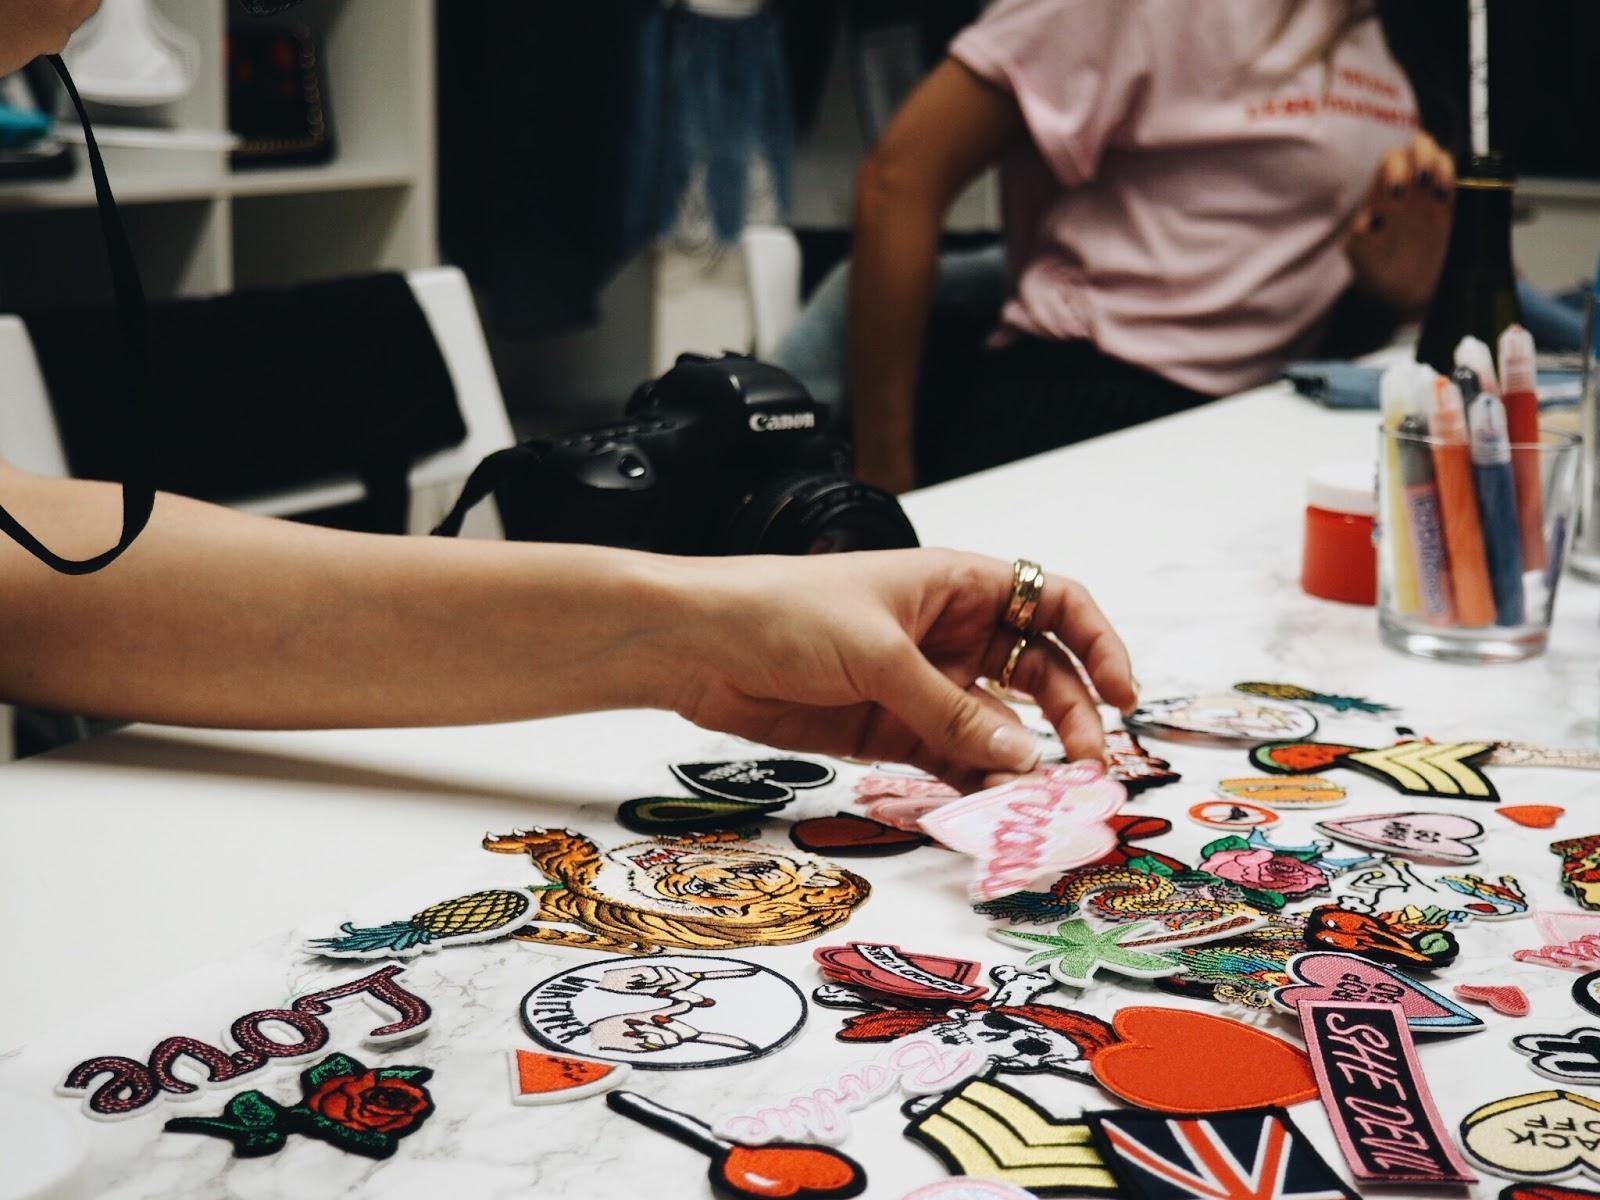 Game nail color workshop - Denim Workshop With Boohoo